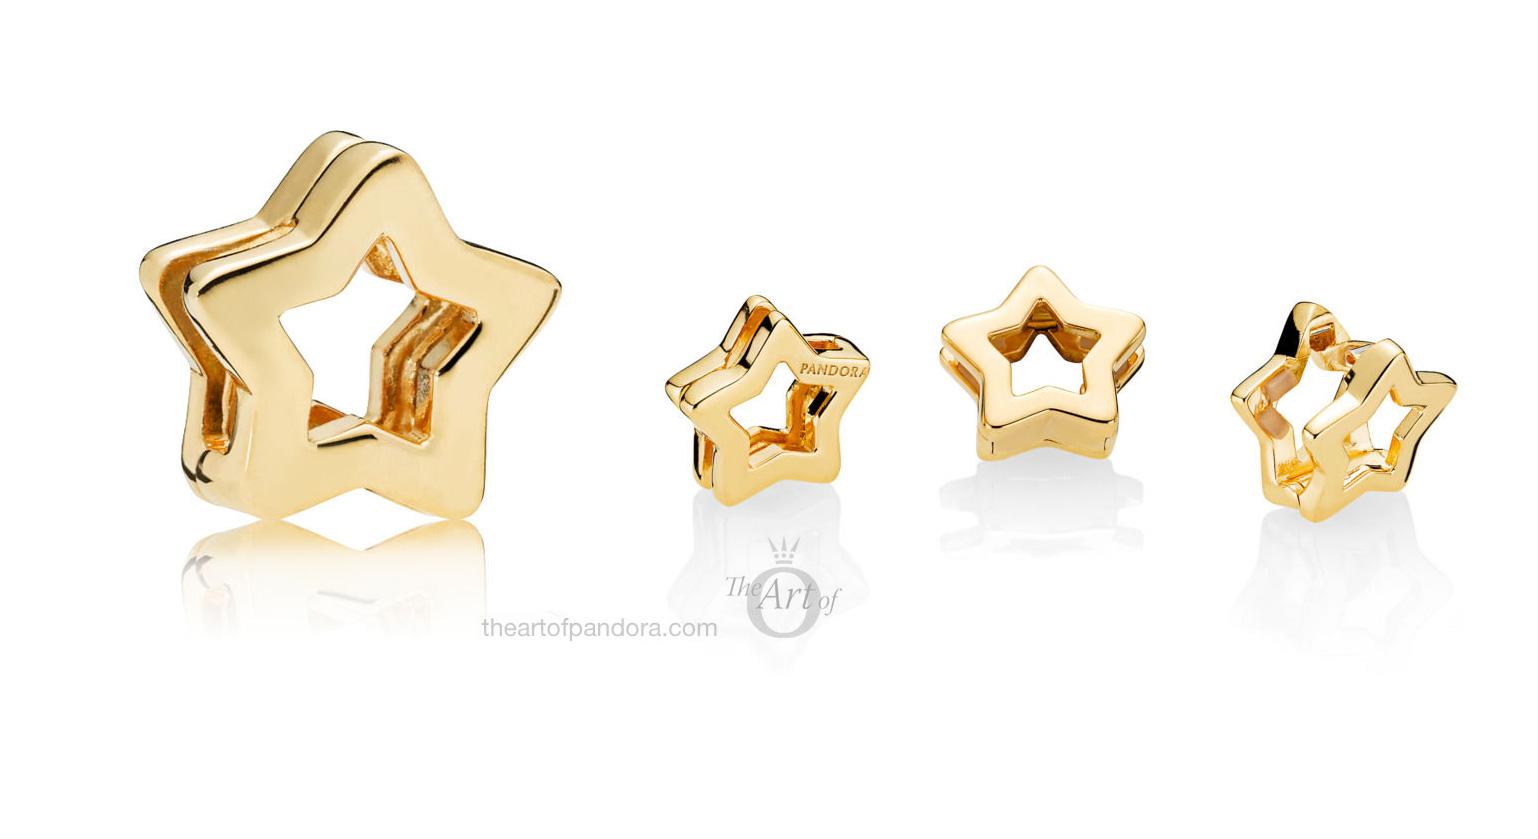 767544-PANDORA-shine-reflexions-star-clip-charm - The Art of ...